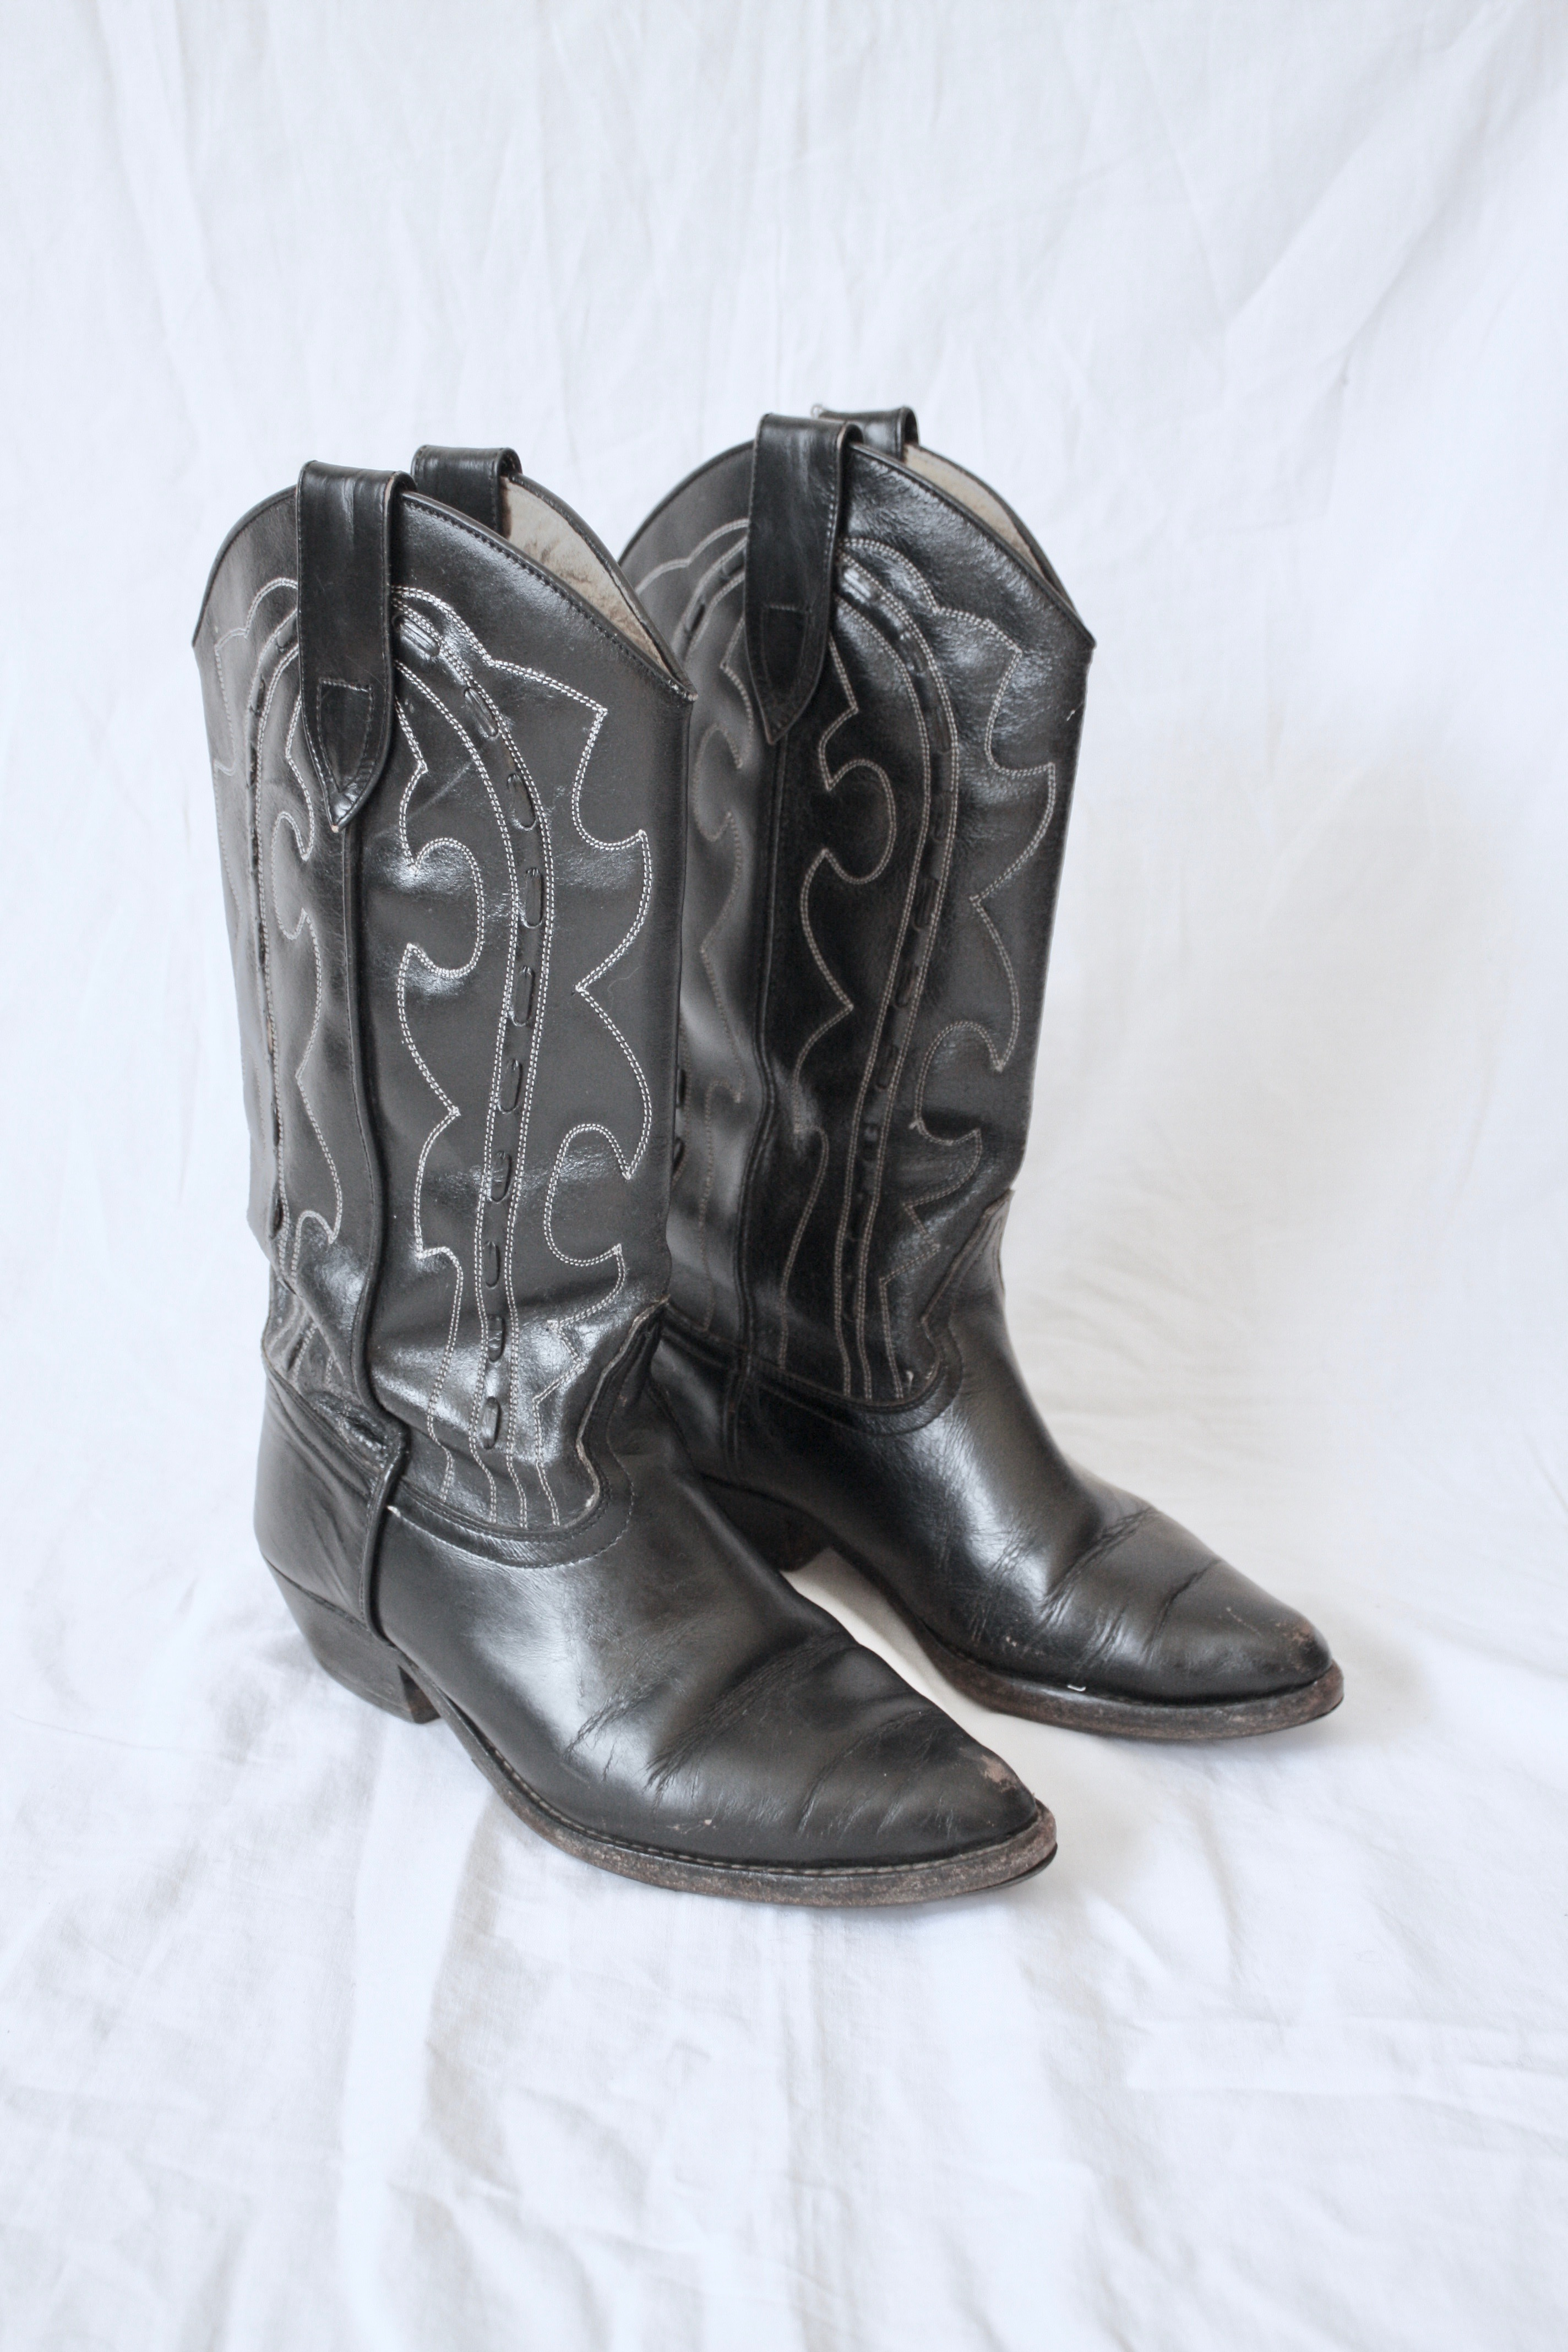 Vintage Western Boots Svart, stl 37